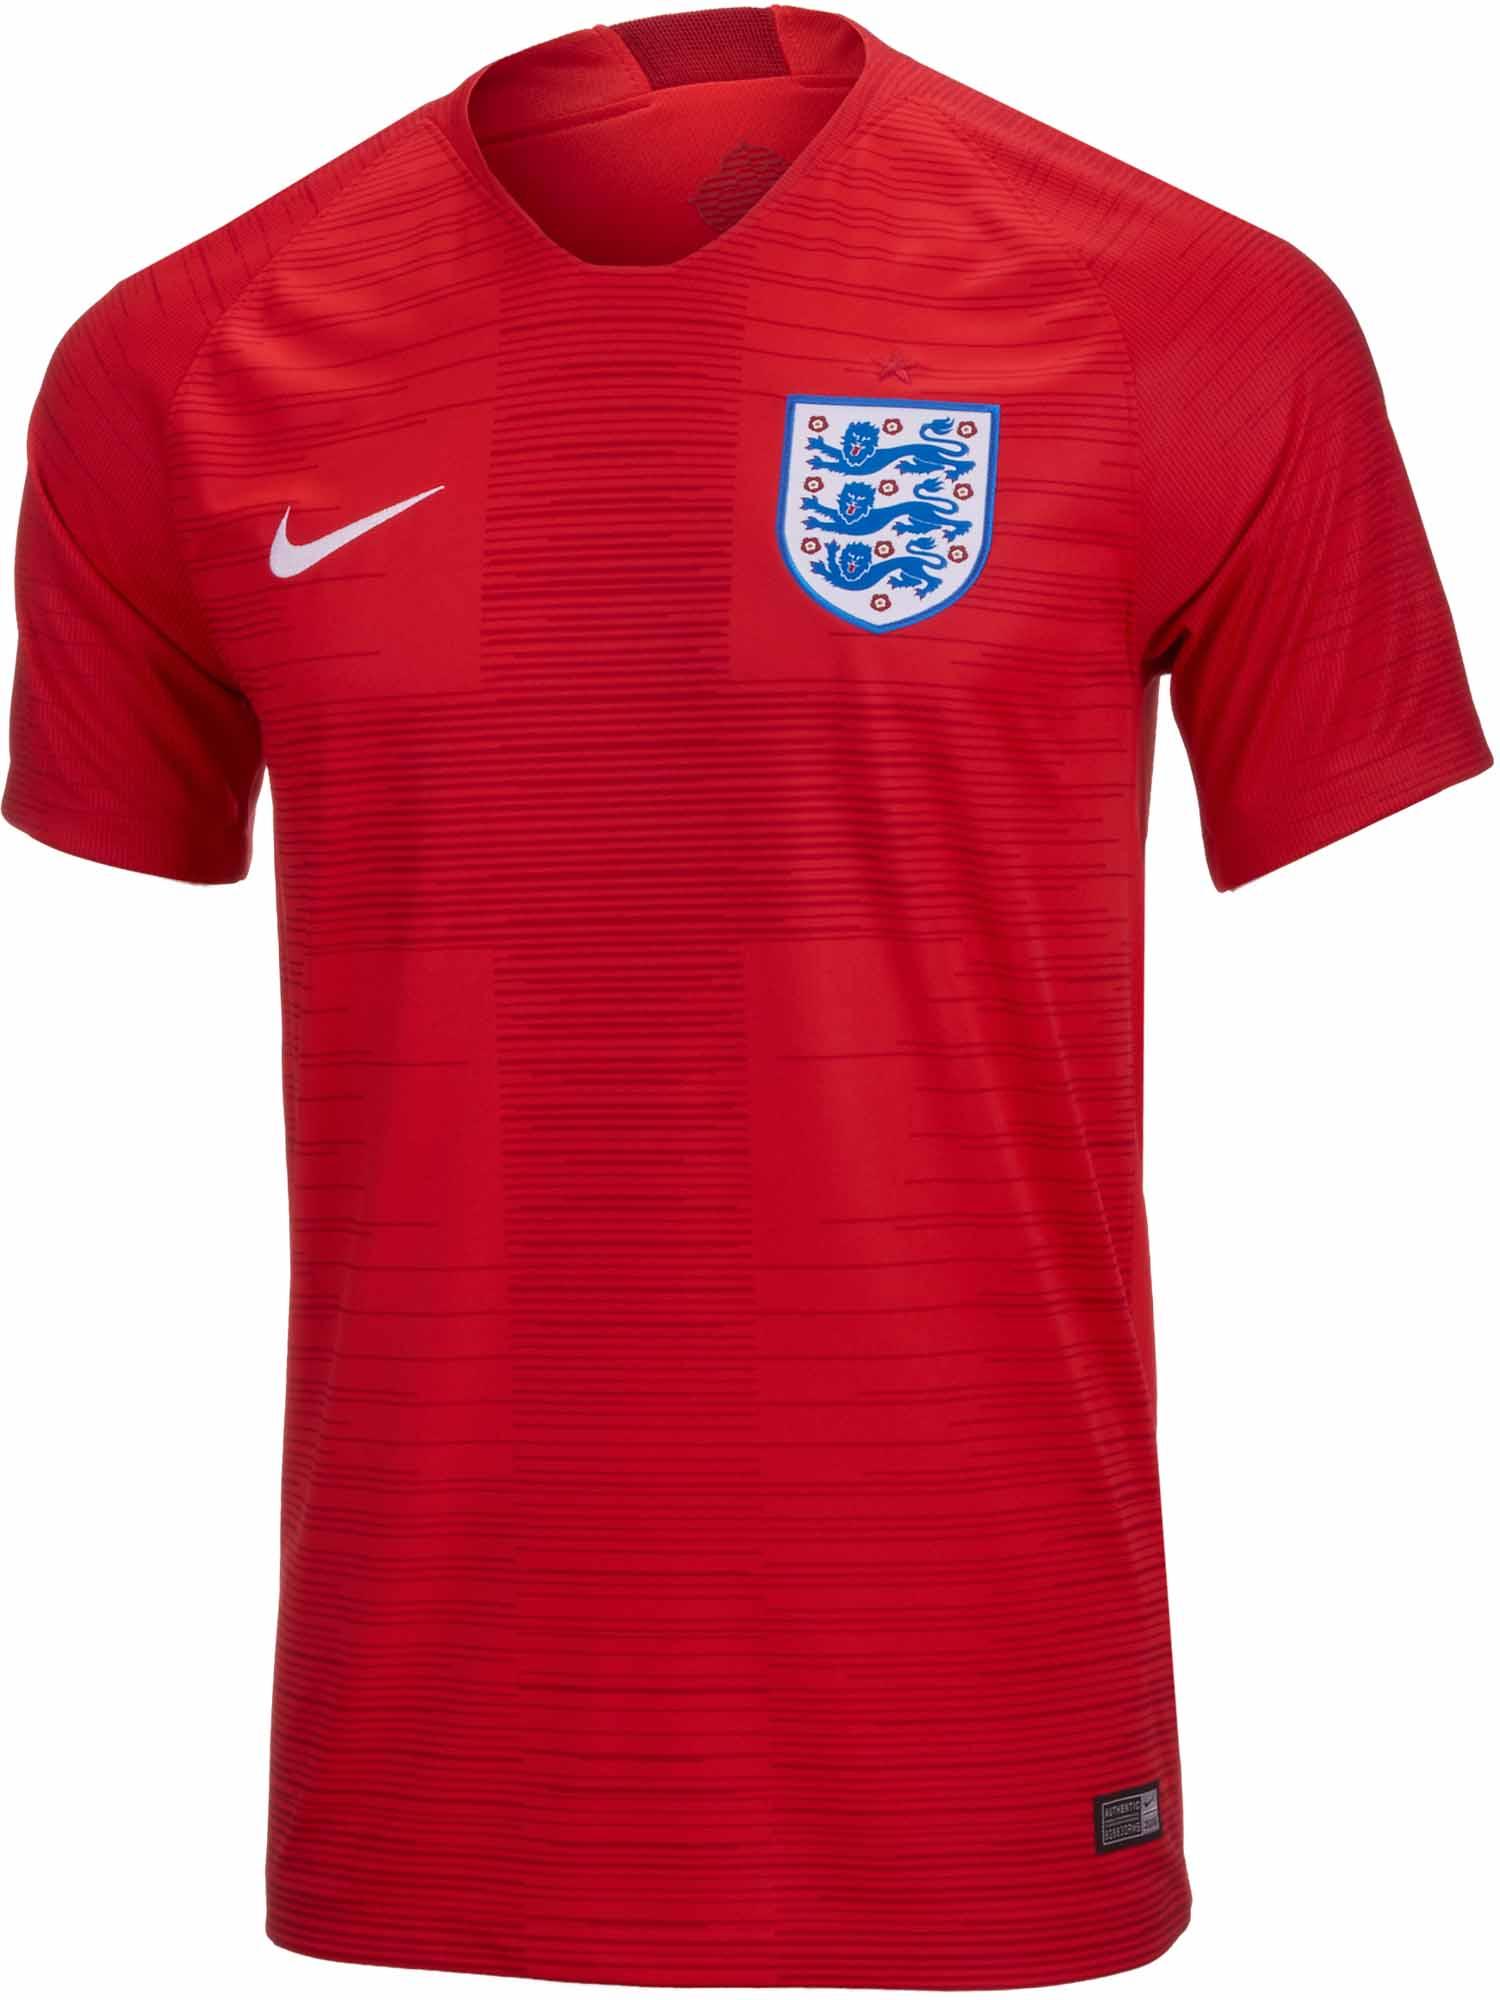 ffab816b1 Nike England Away Jersey 2018-19 - Soccerpro.com